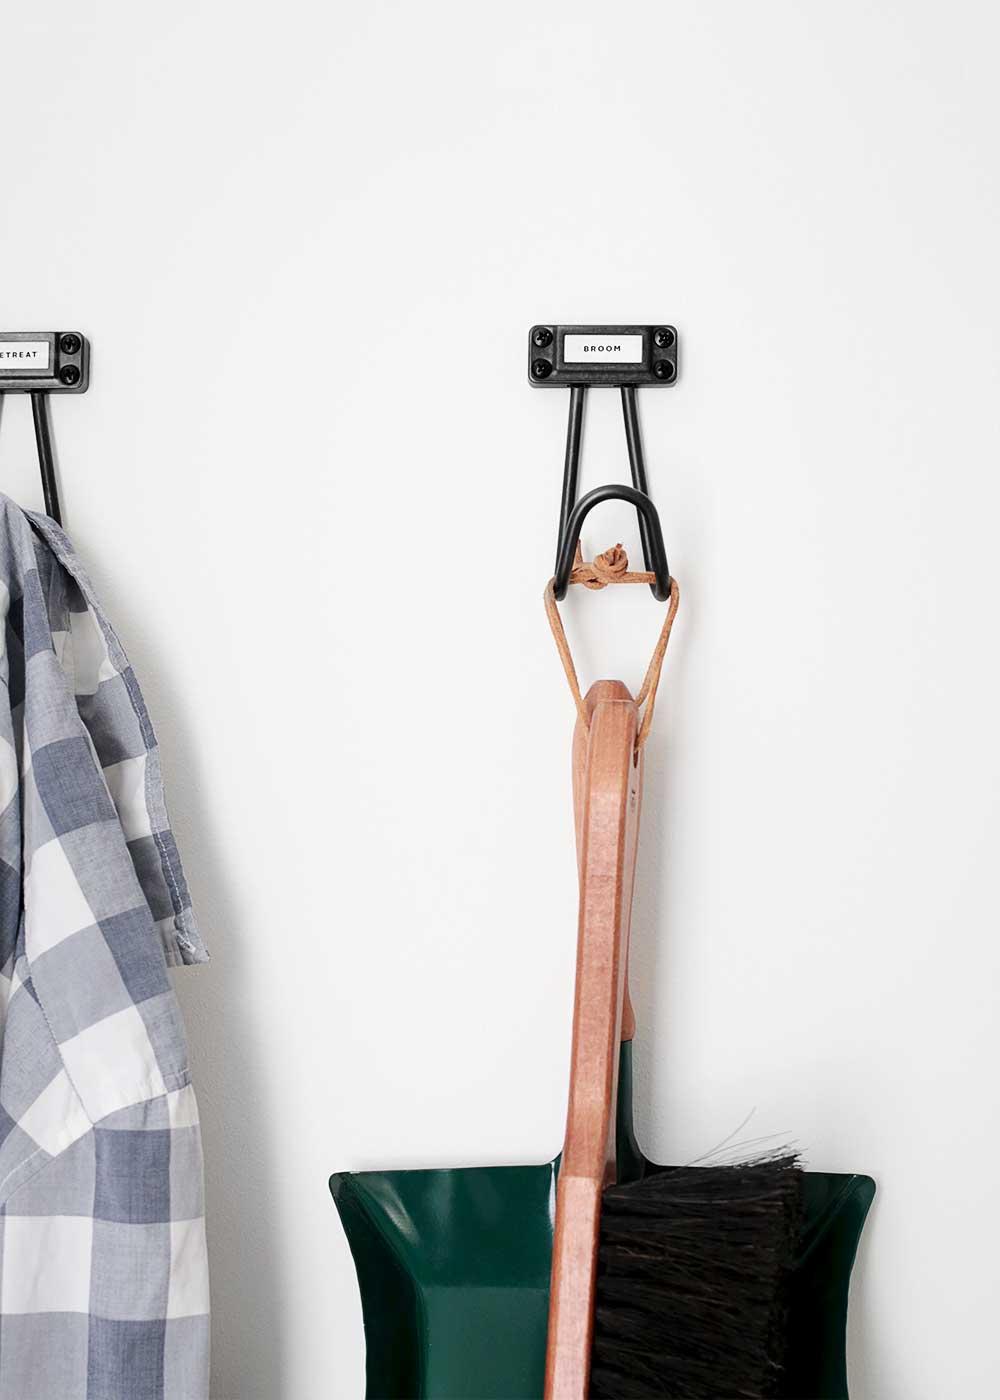 Laundry Room hooks from The Fauxmartha